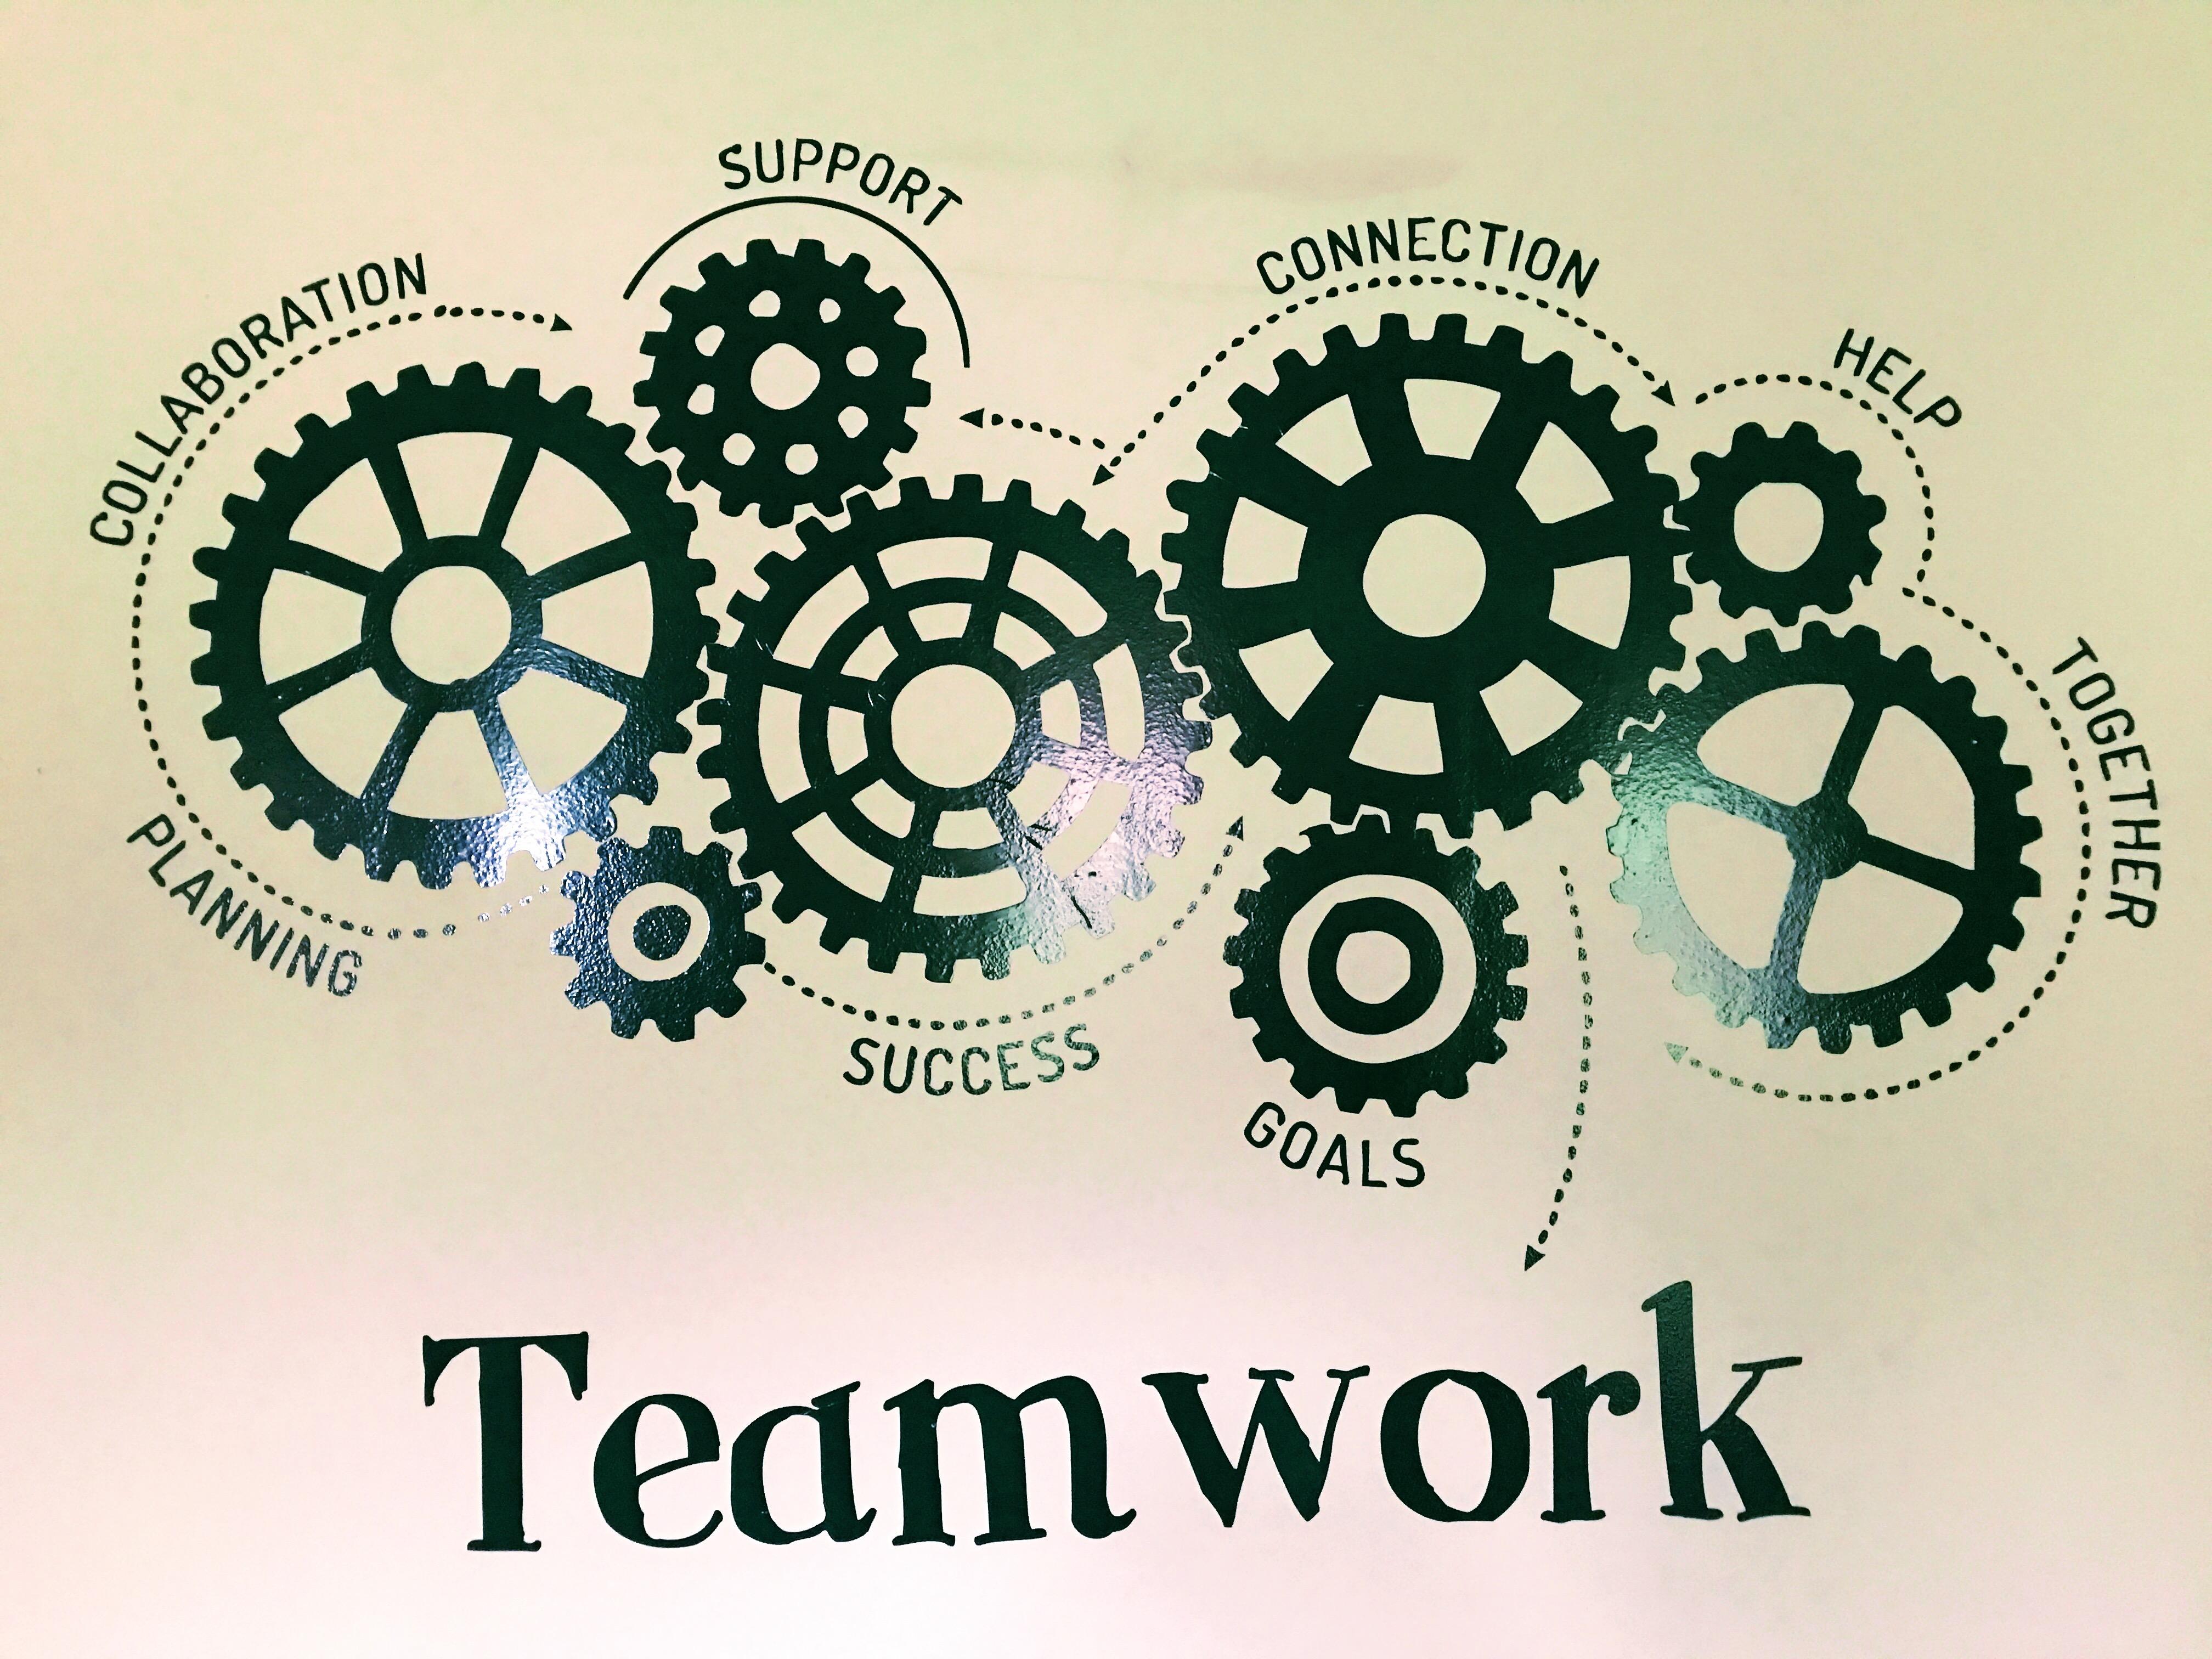 GVINC Teamwork